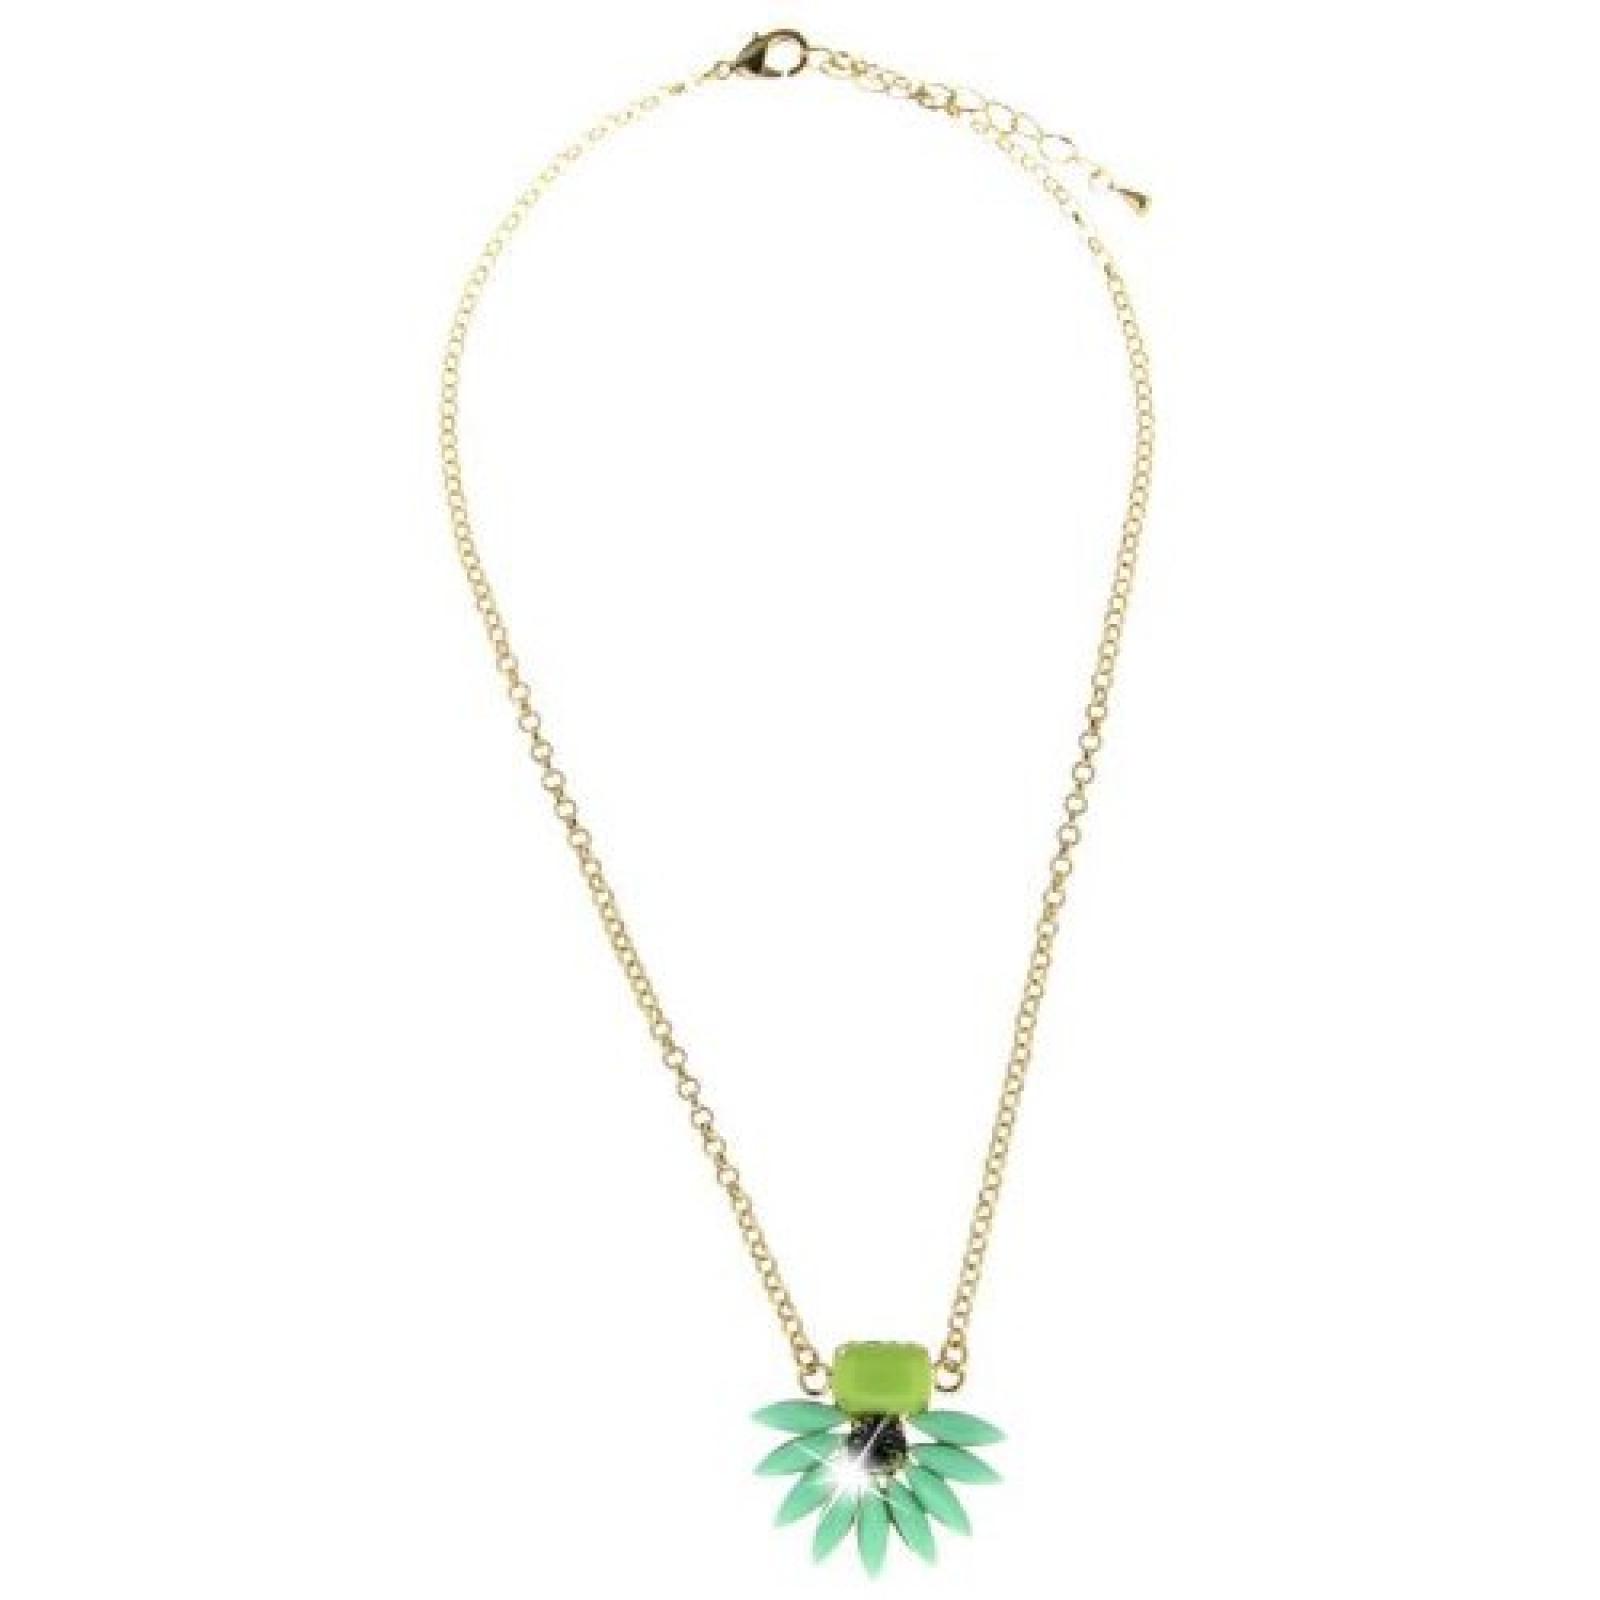 Sweet Deluxe Damen Halskette Metall rhodiniert Glas 45 cm gold/grünkombi 3151